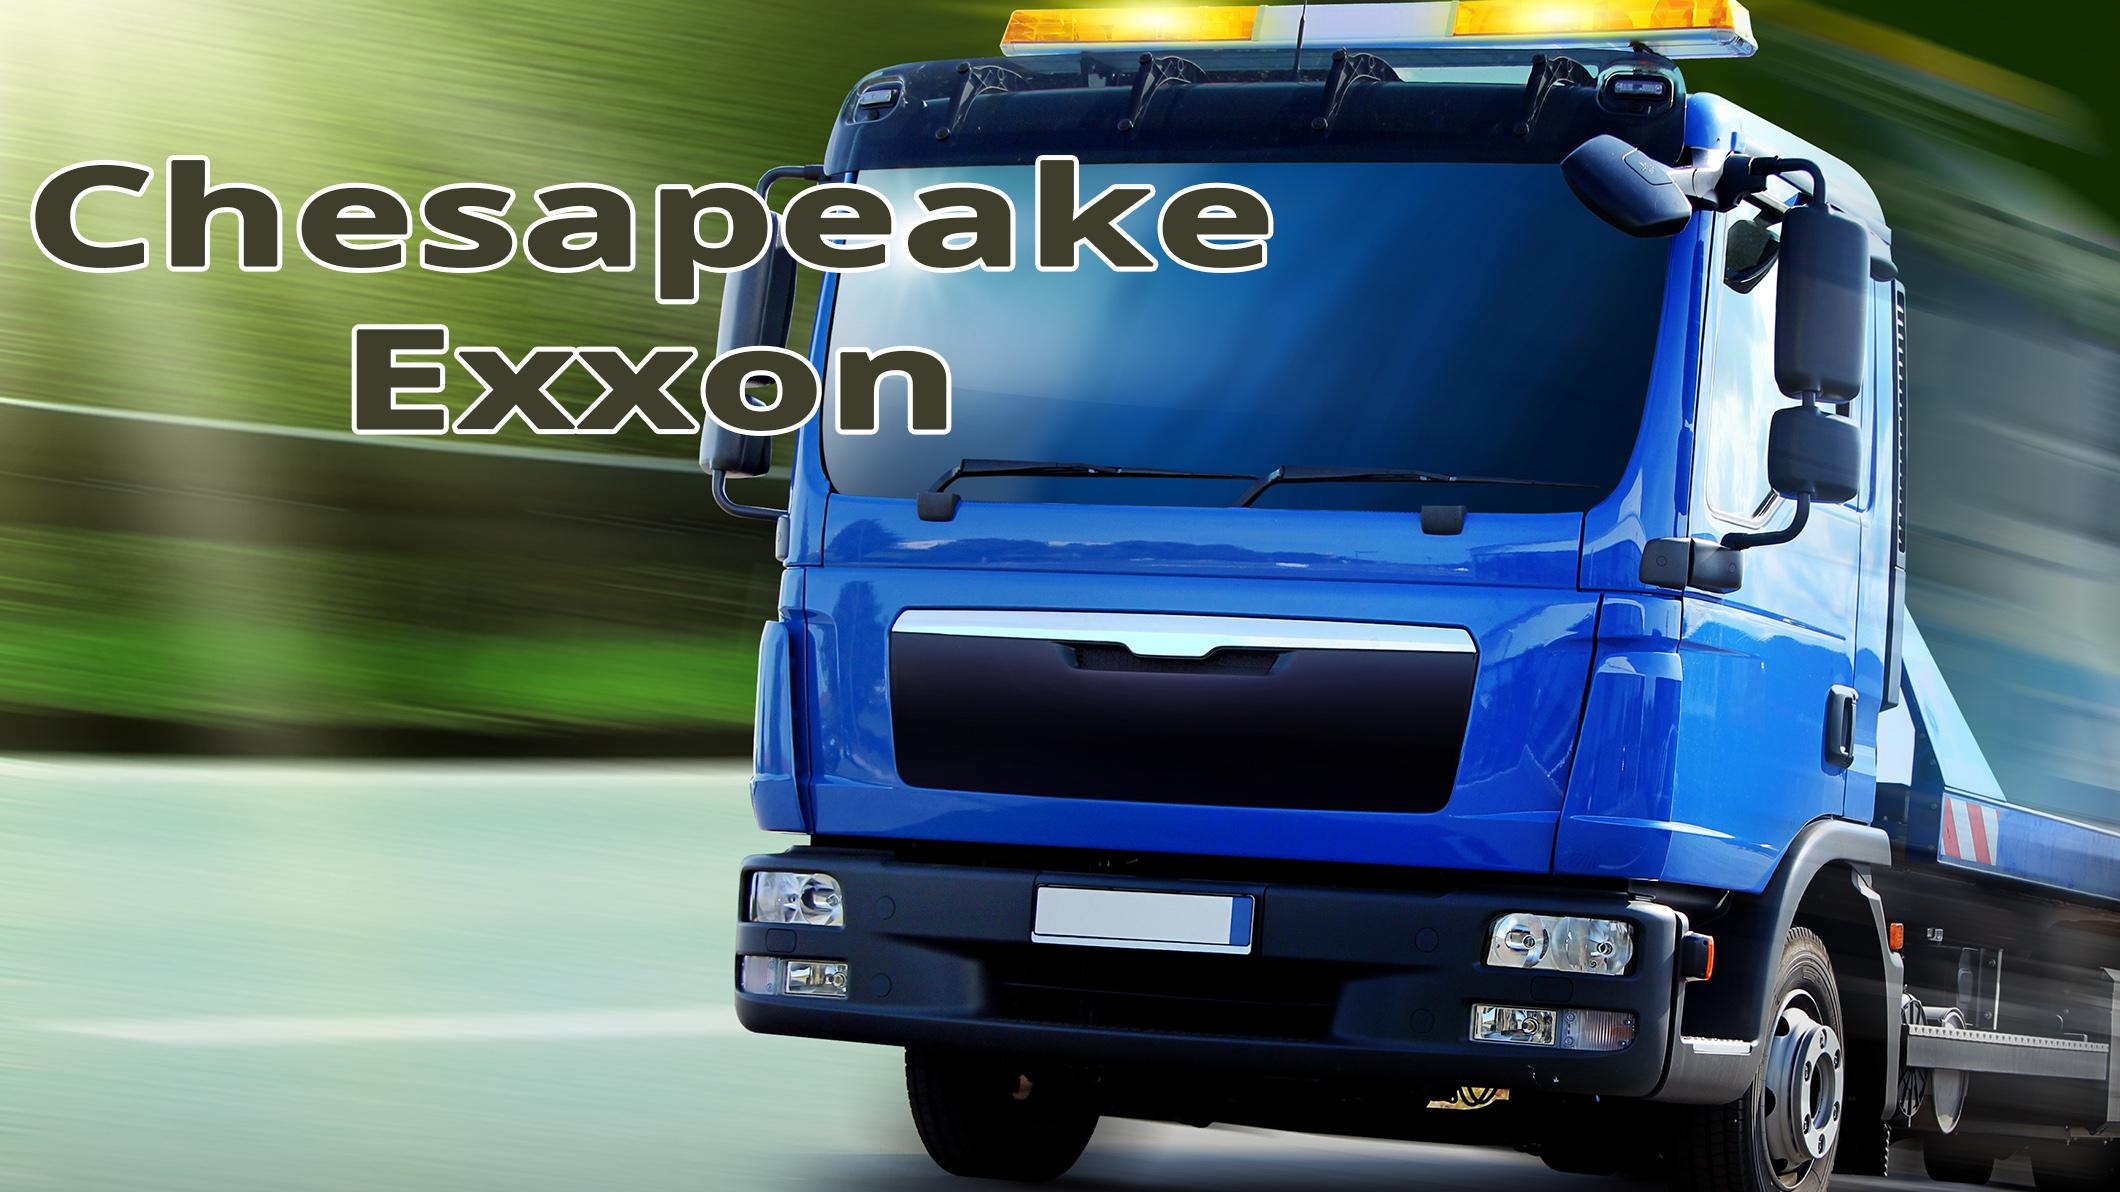 Chesapeake Exxon In Annapolis Md 21401